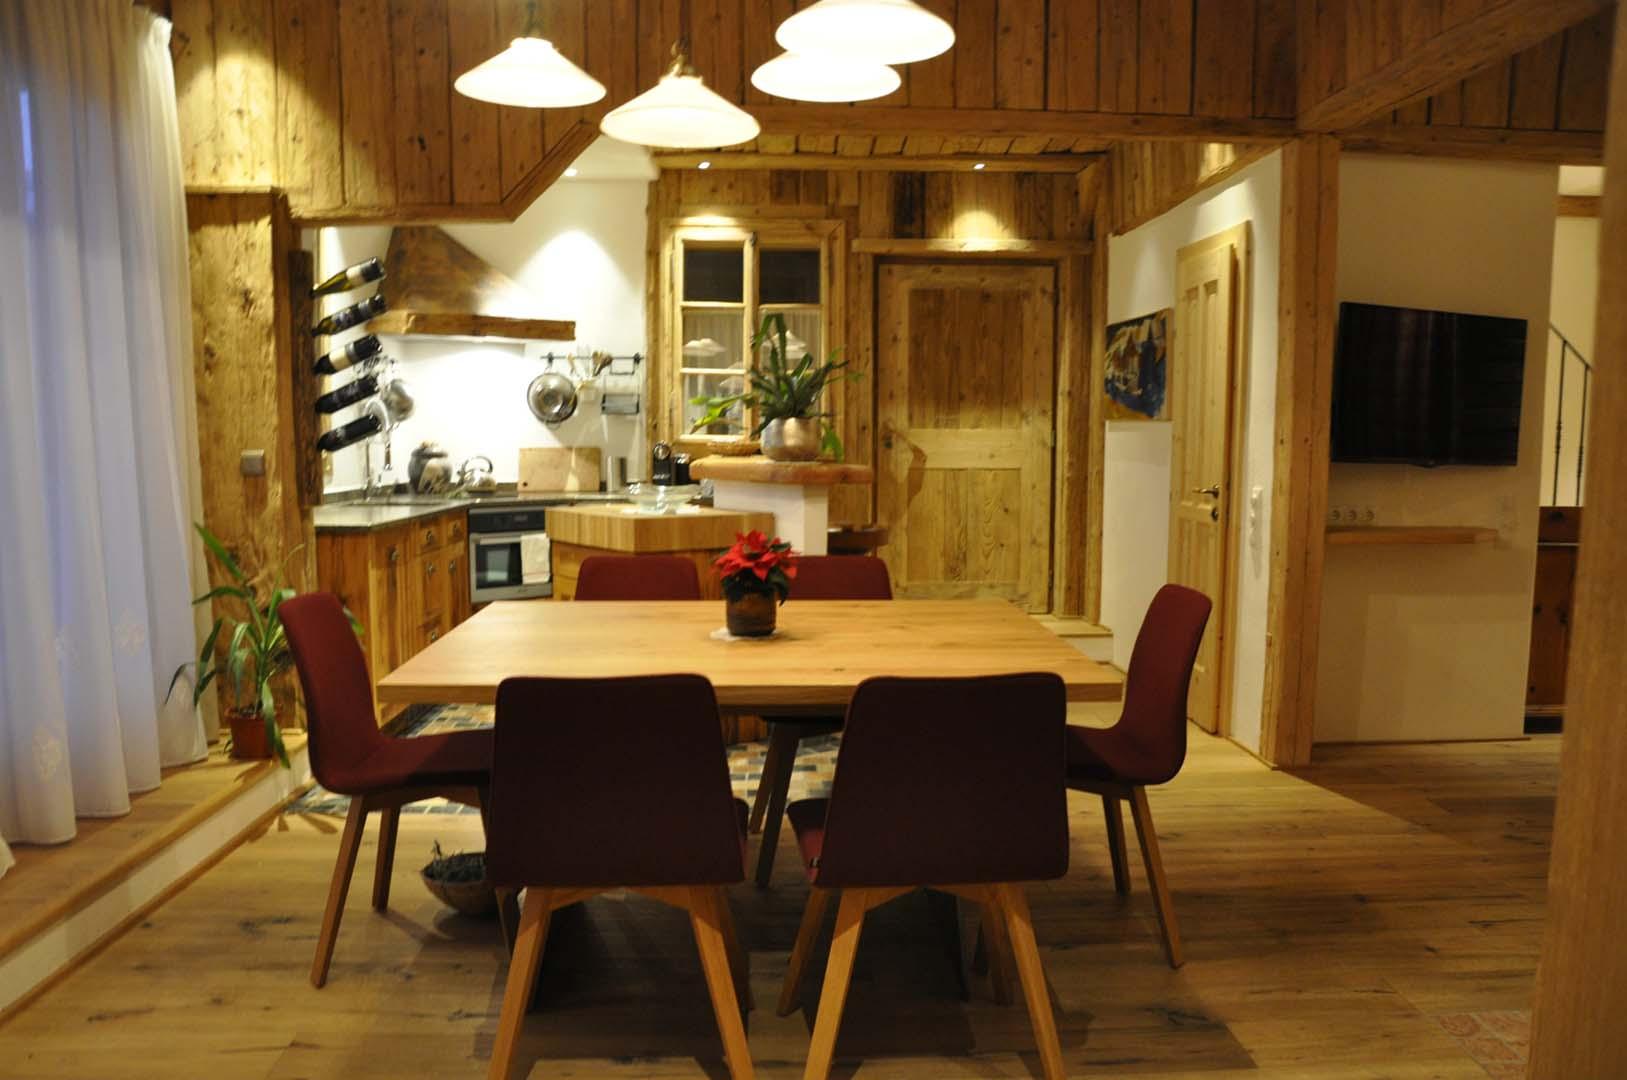 die heimatliebe luxus chalet serfaus fiss ladis. Black Bedroom Furniture Sets. Home Design Ideas